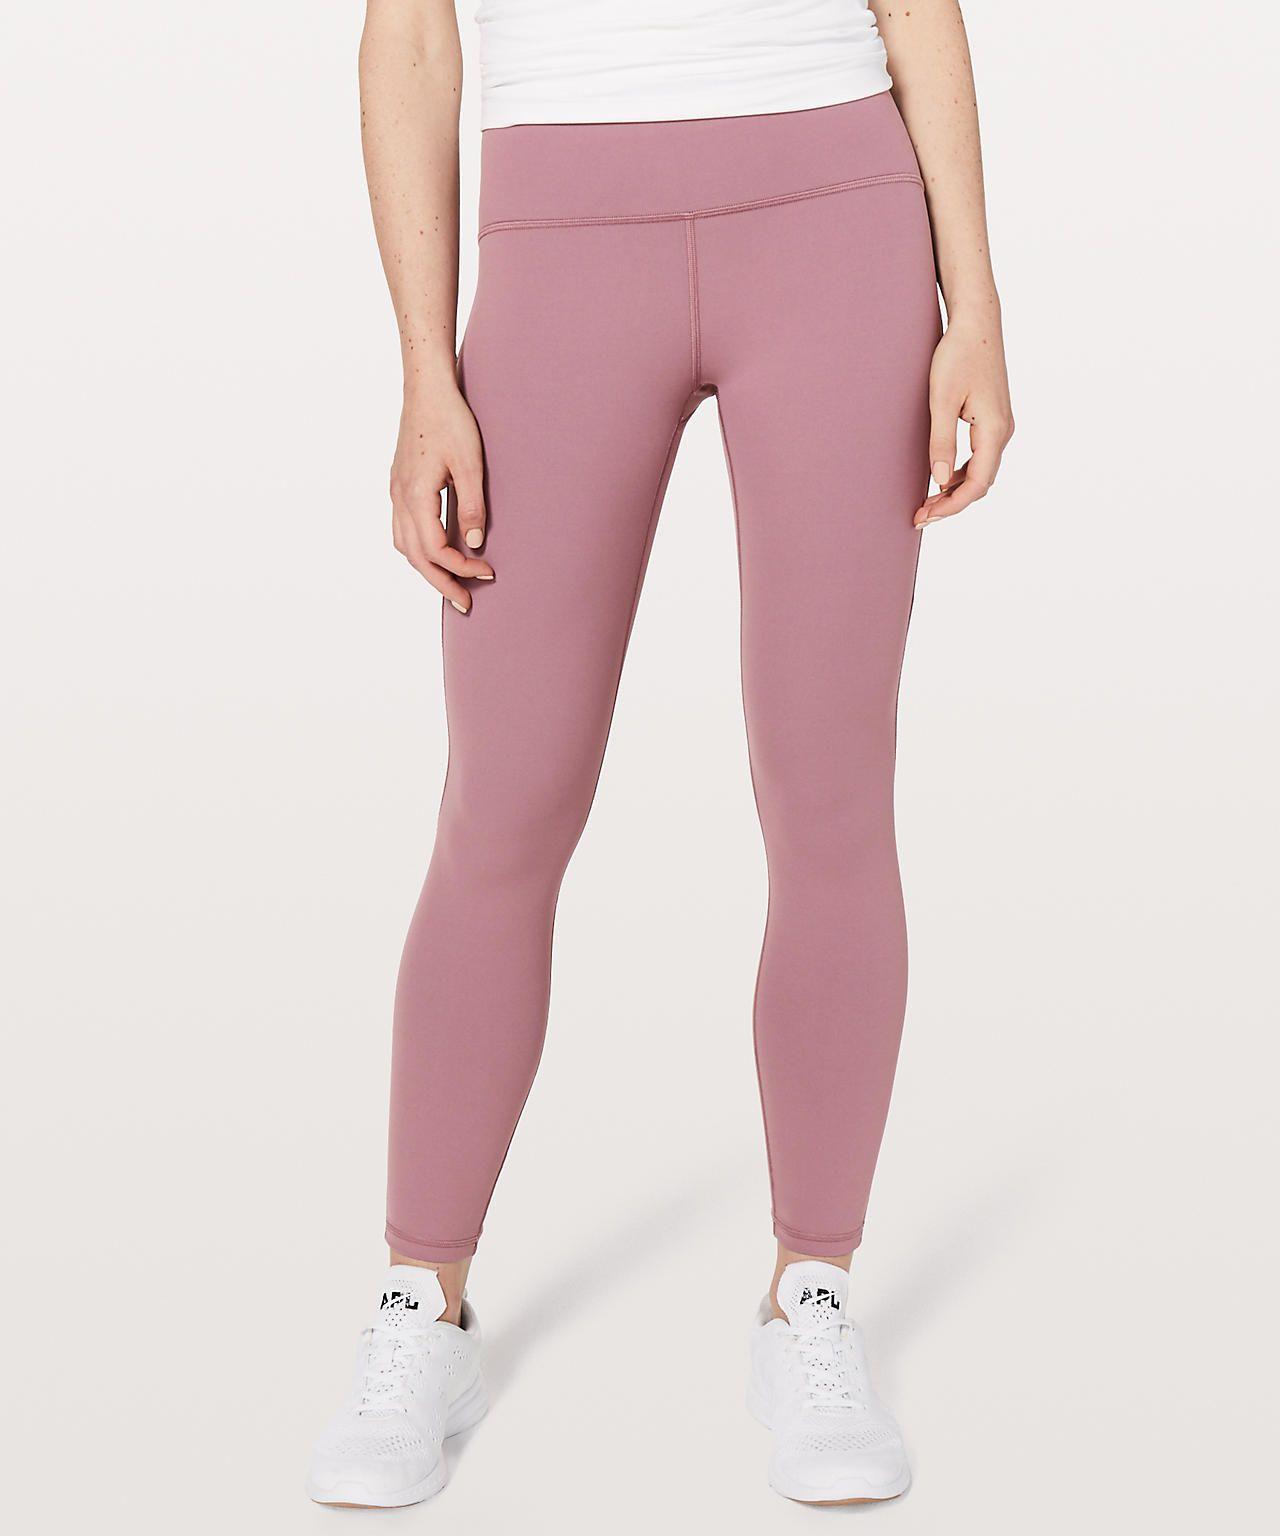 ec1c6795229de Misty Merlot GIFT IDEAS t Lululemon Pants for women